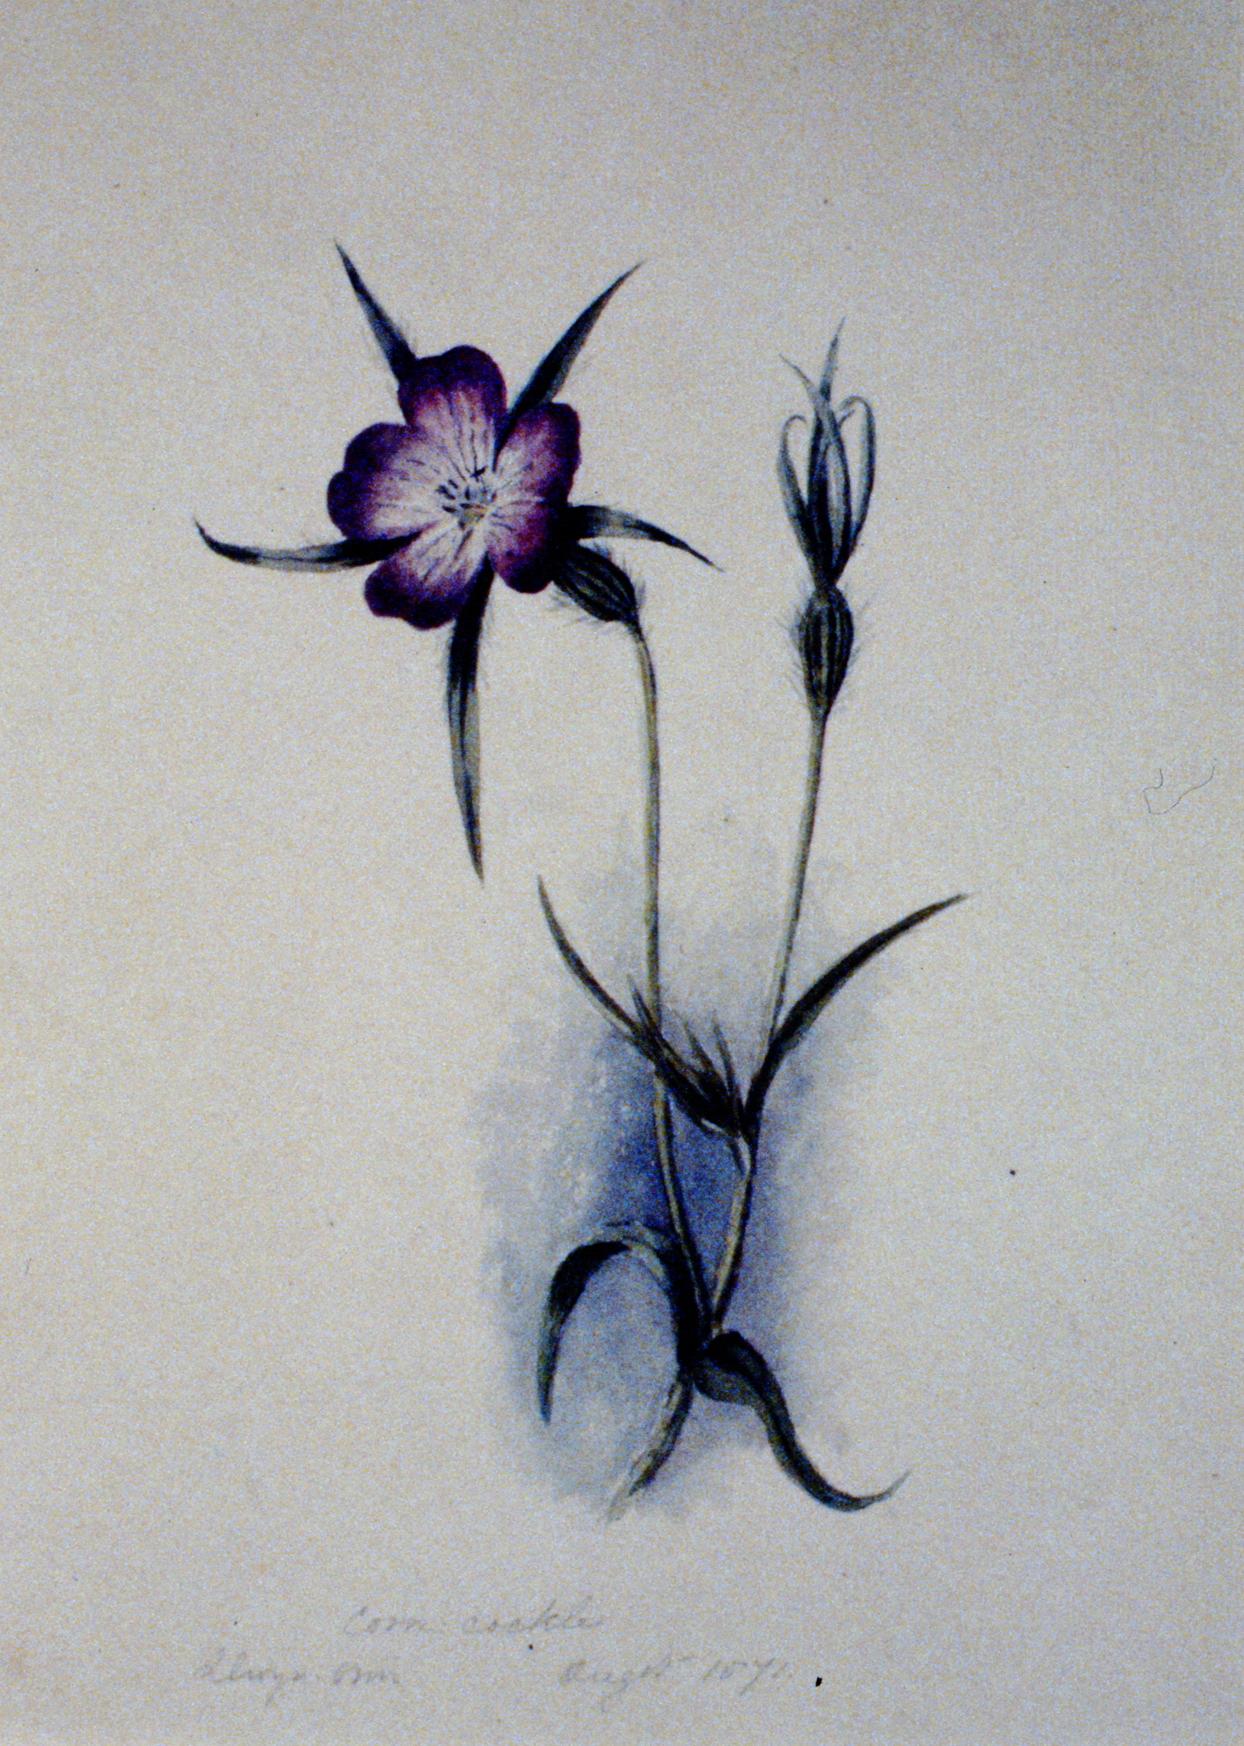 Corn-Cockle , 1871, Julia Bullock Webster, watercolour on paper, 27.5 x 20 cm,1983.02.30.Gift of Mrs. Barbara Steel.